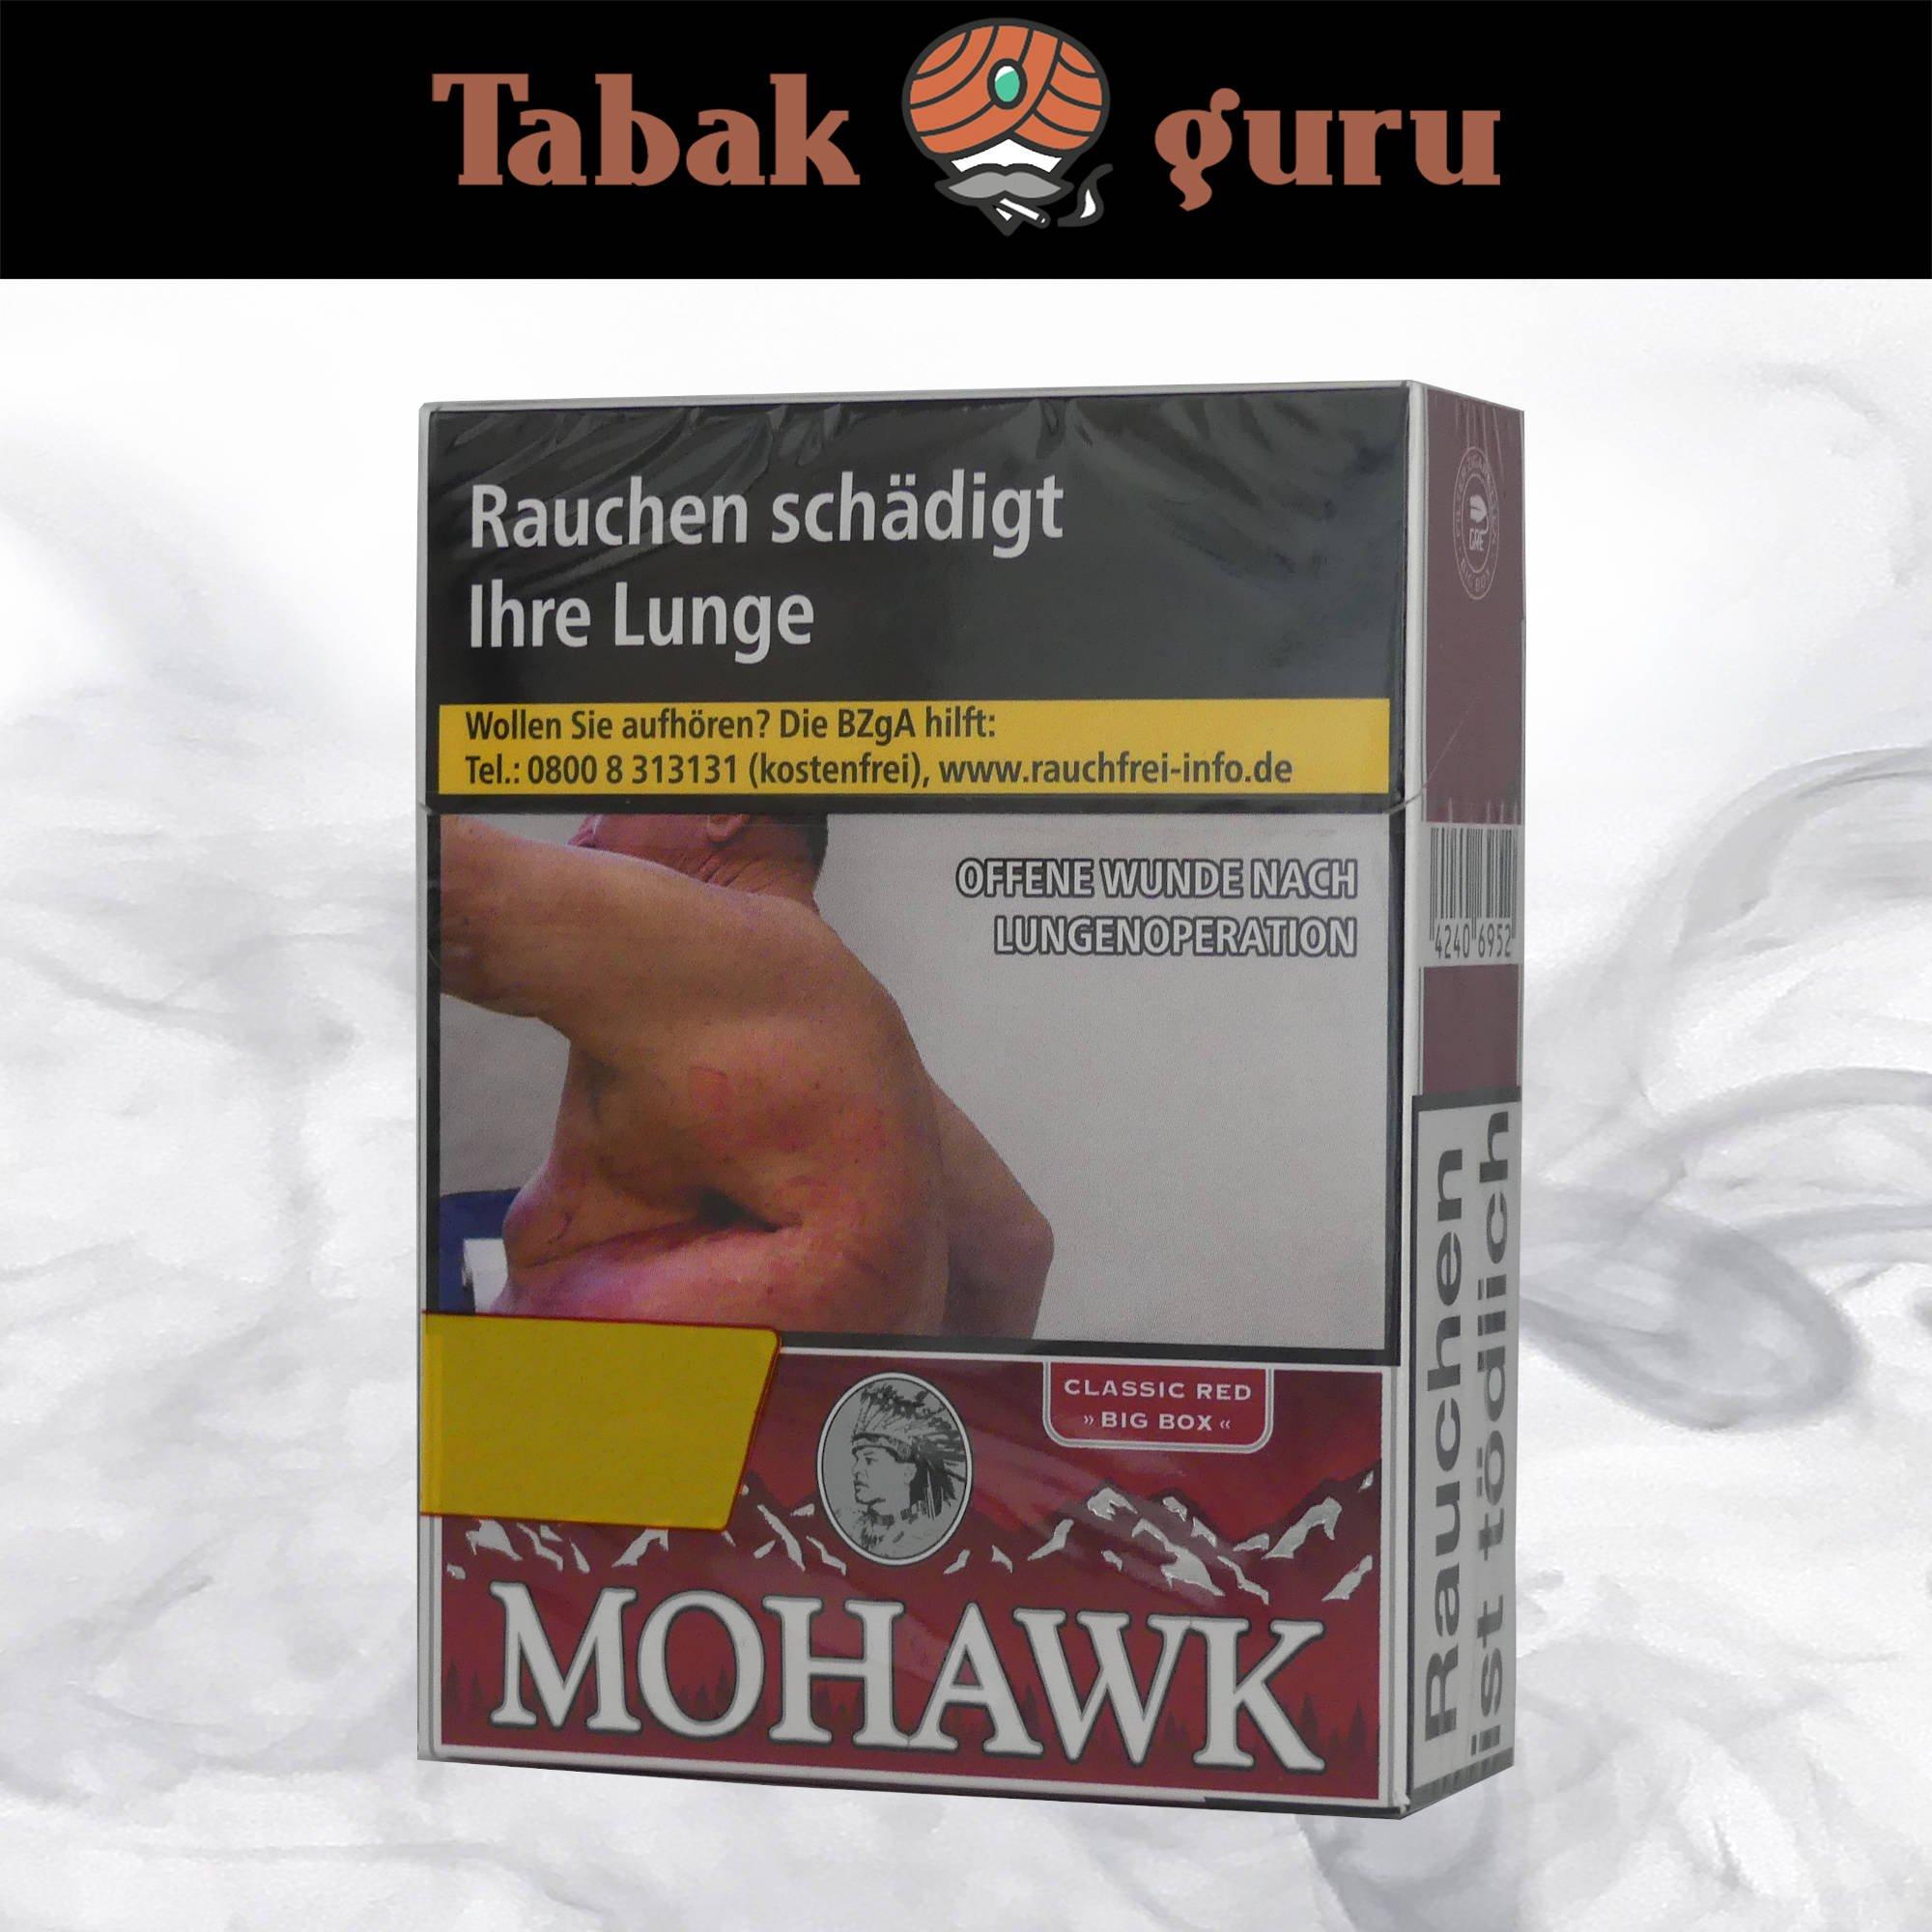 Mohawk Classic Red Filterzigaretten Big Box